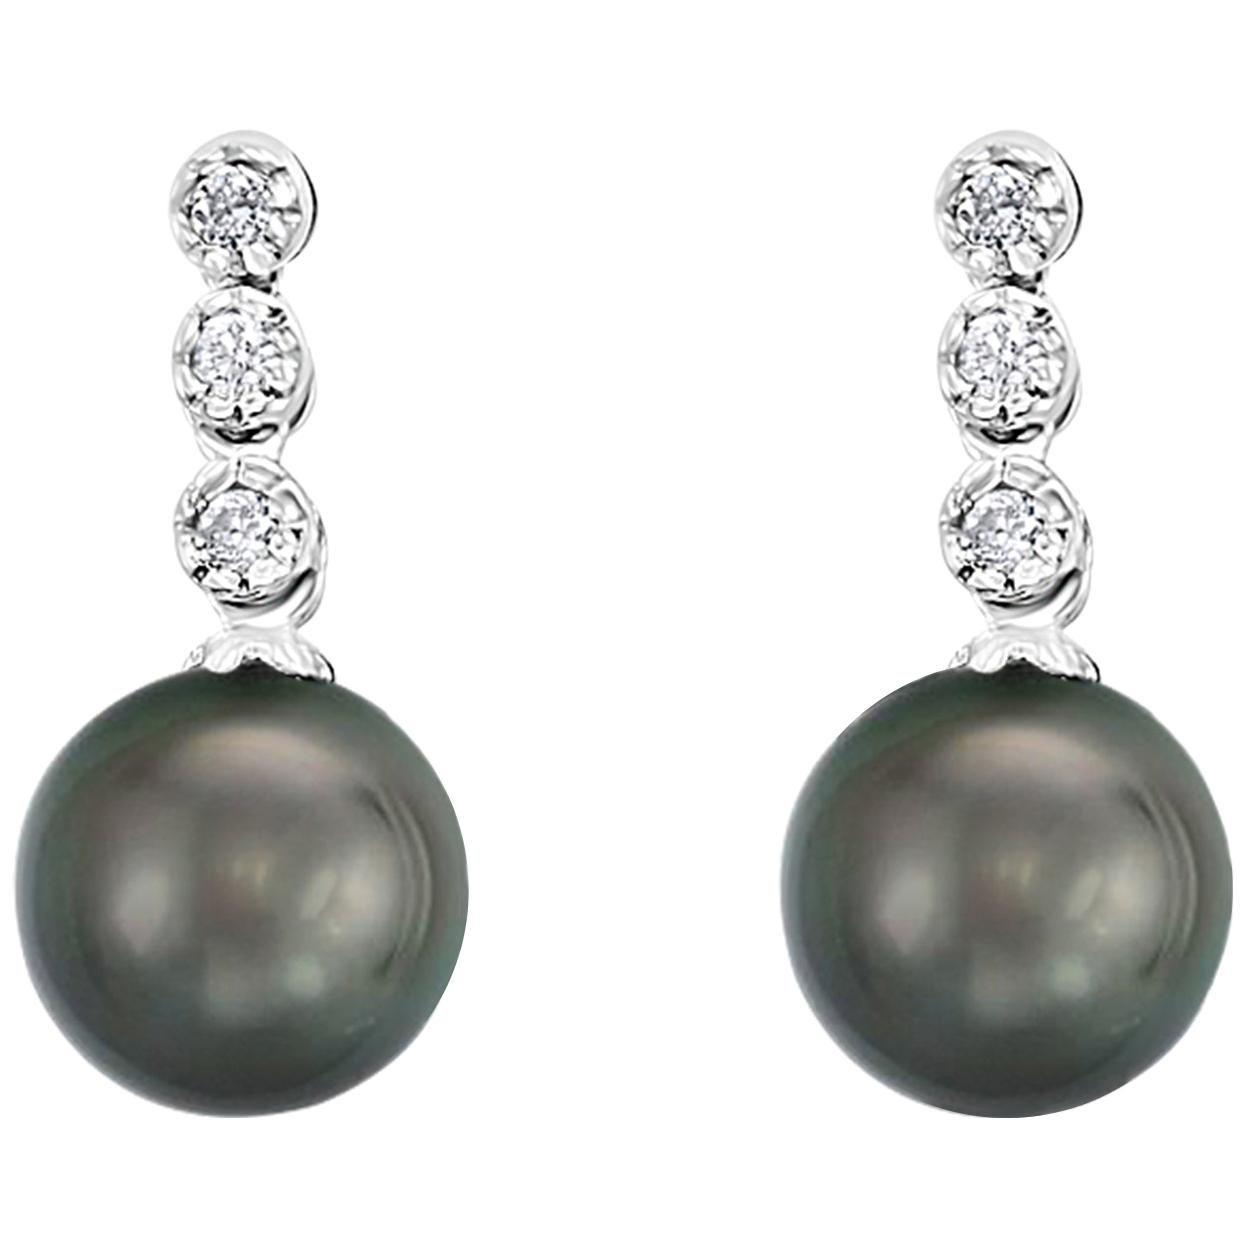 14 Karat White Gold South Sea Tahitian Cultured Pearl and Diamond Earrings